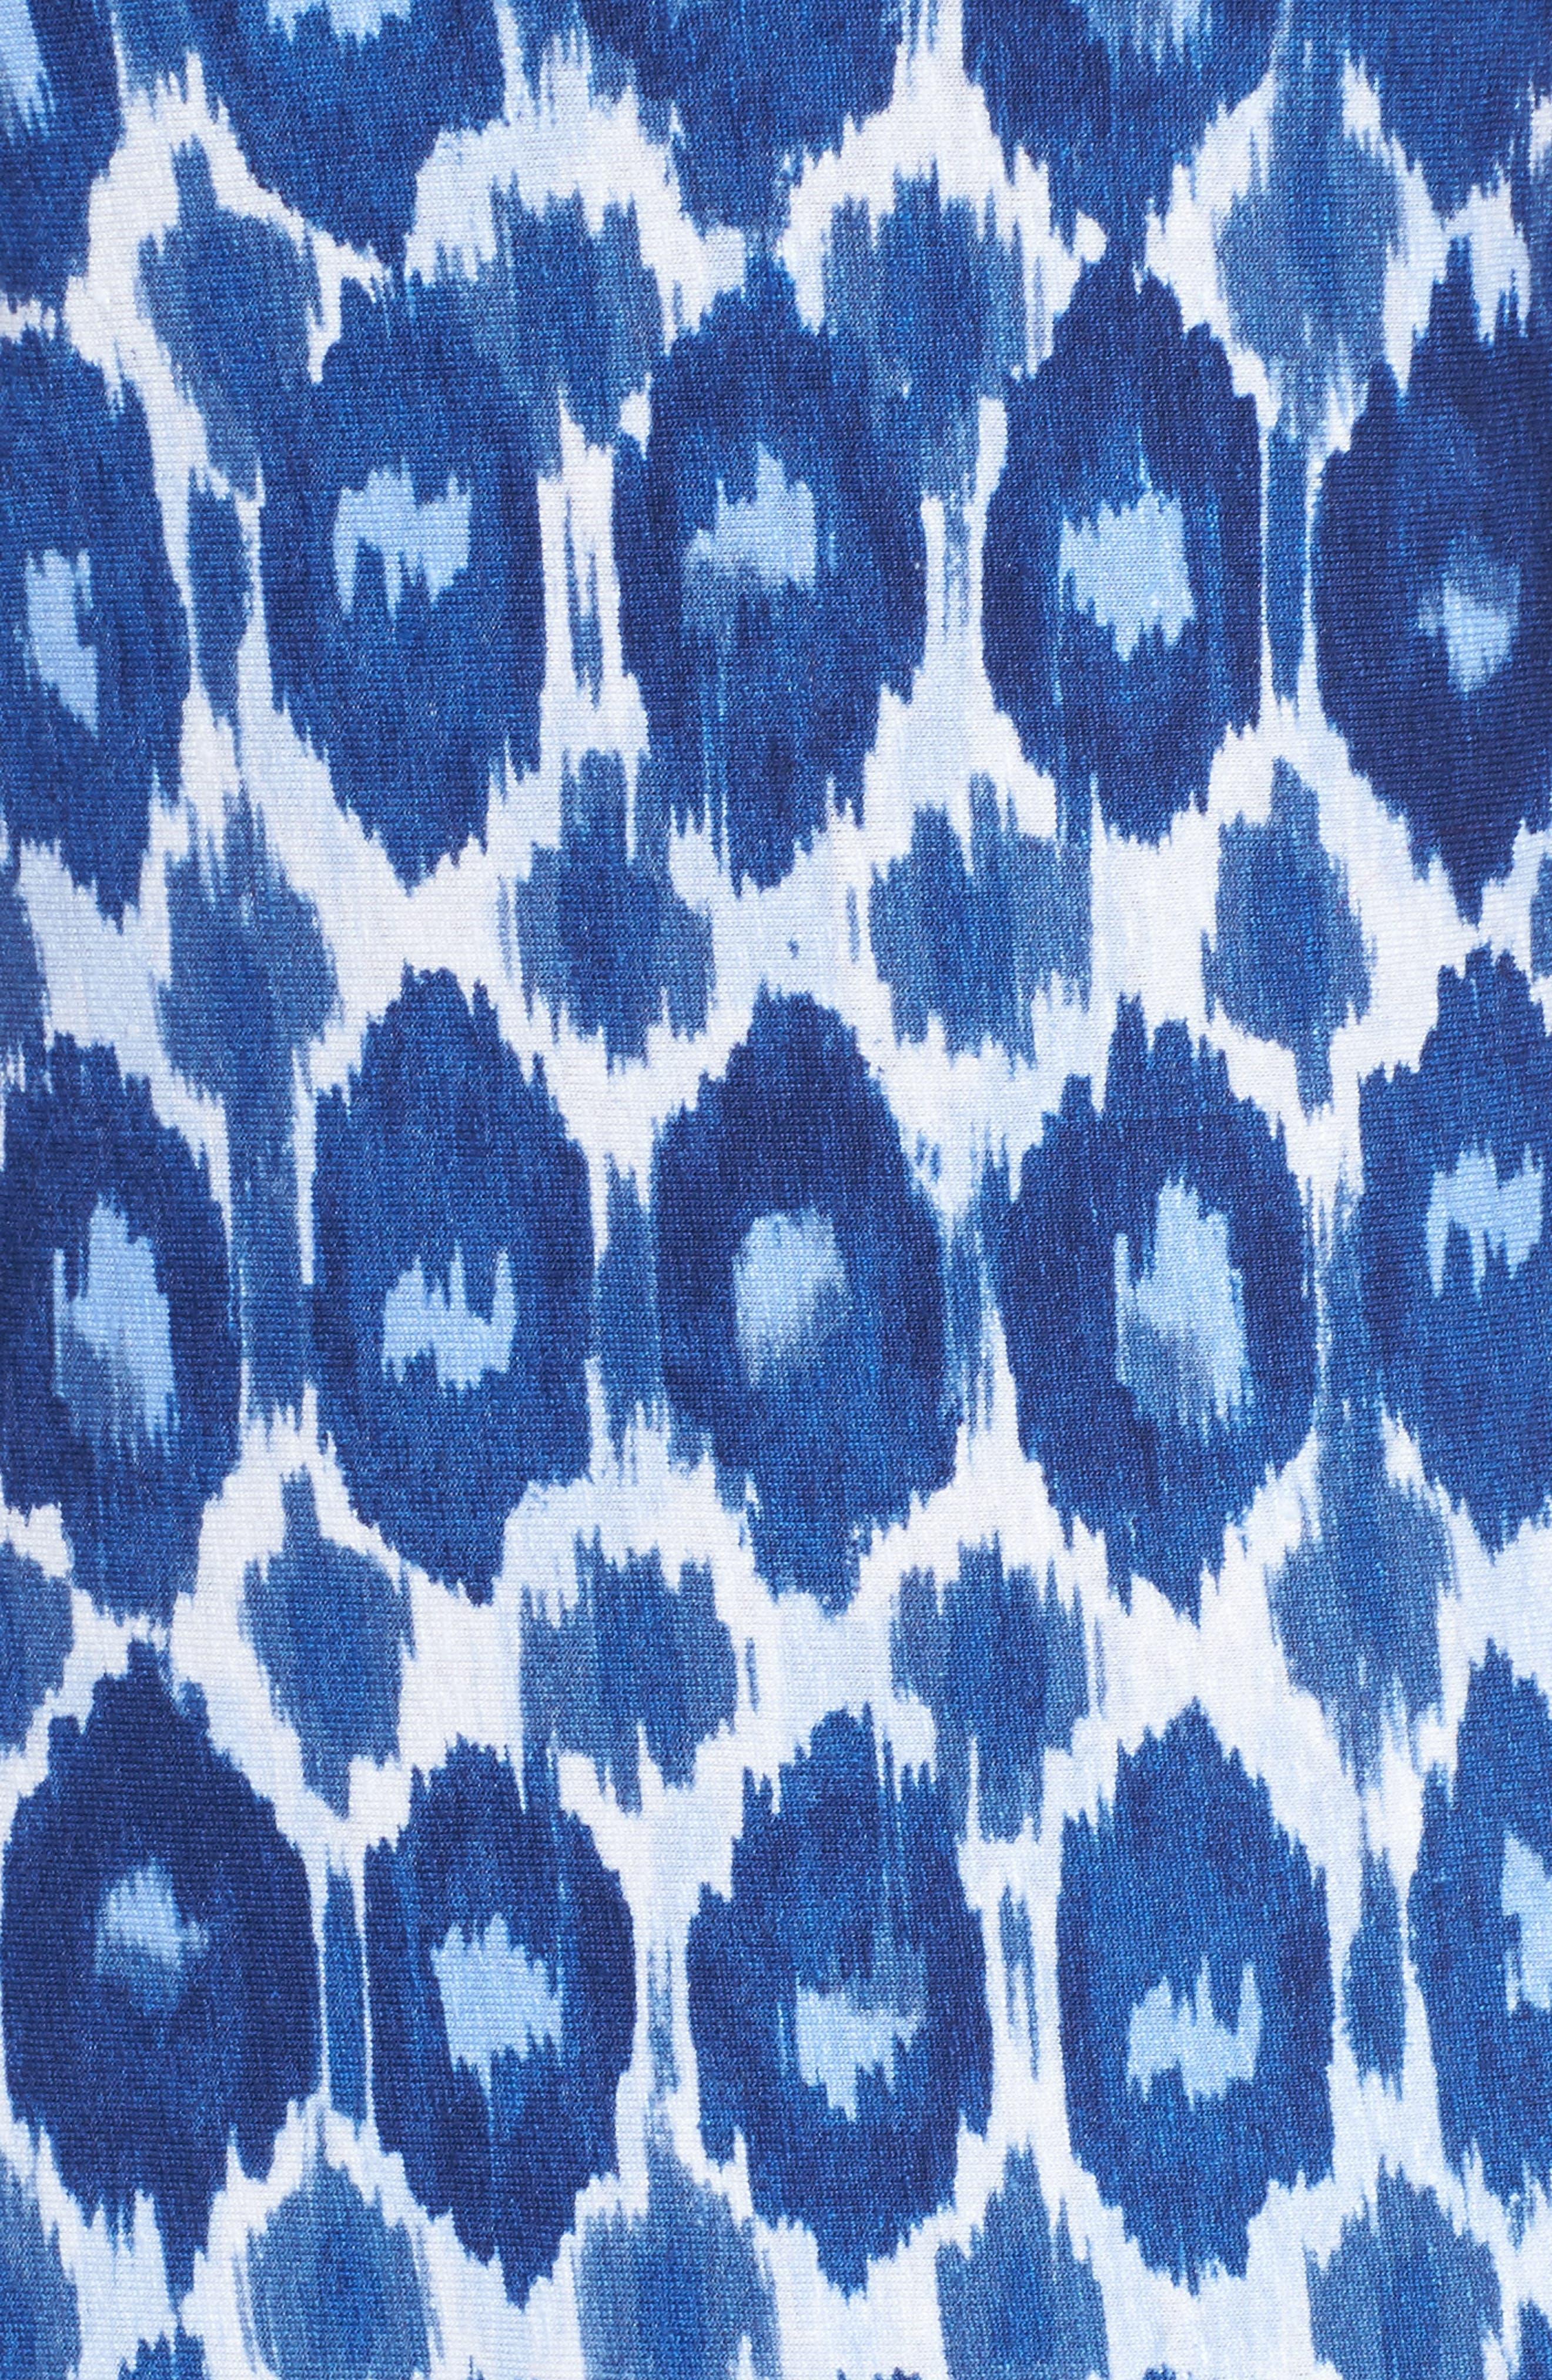 Innercoastal Ikat Sleeveless Dress,                             Alternate thumbnail 5, color,                             KINGDOM BLUE